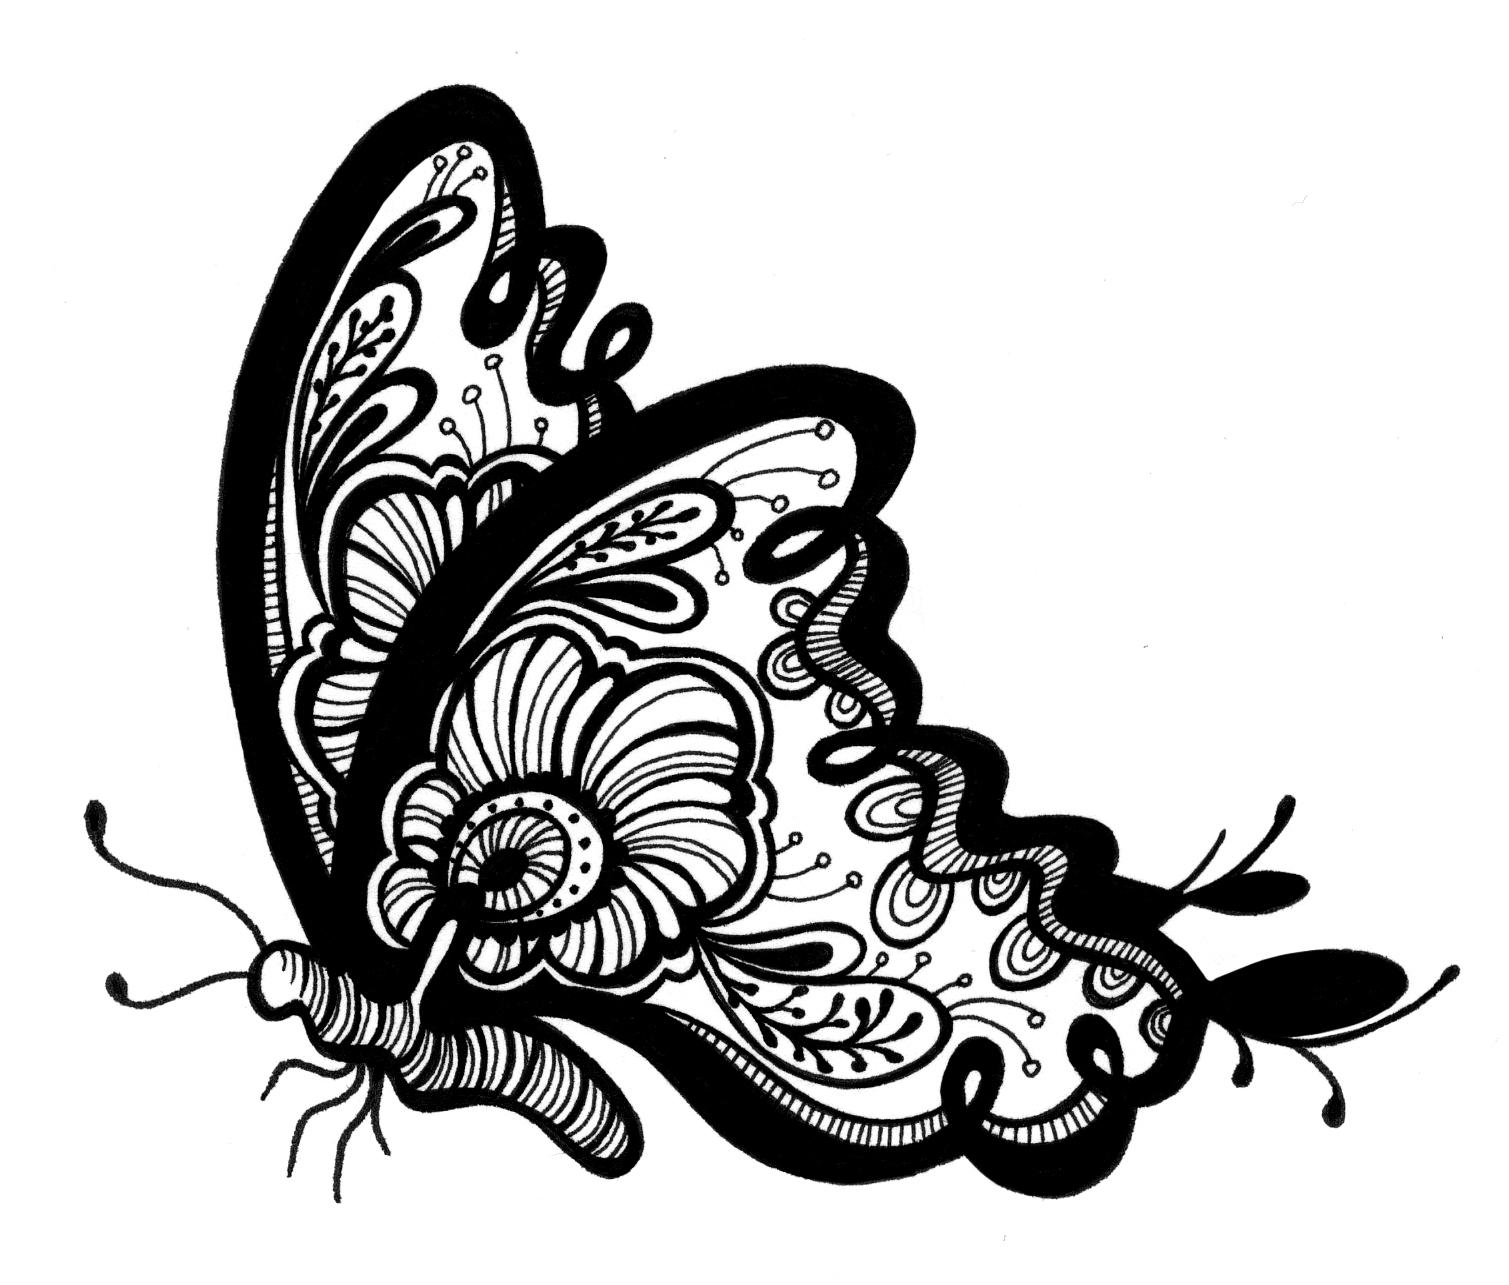 ButterflyTattoo.jpg (image)